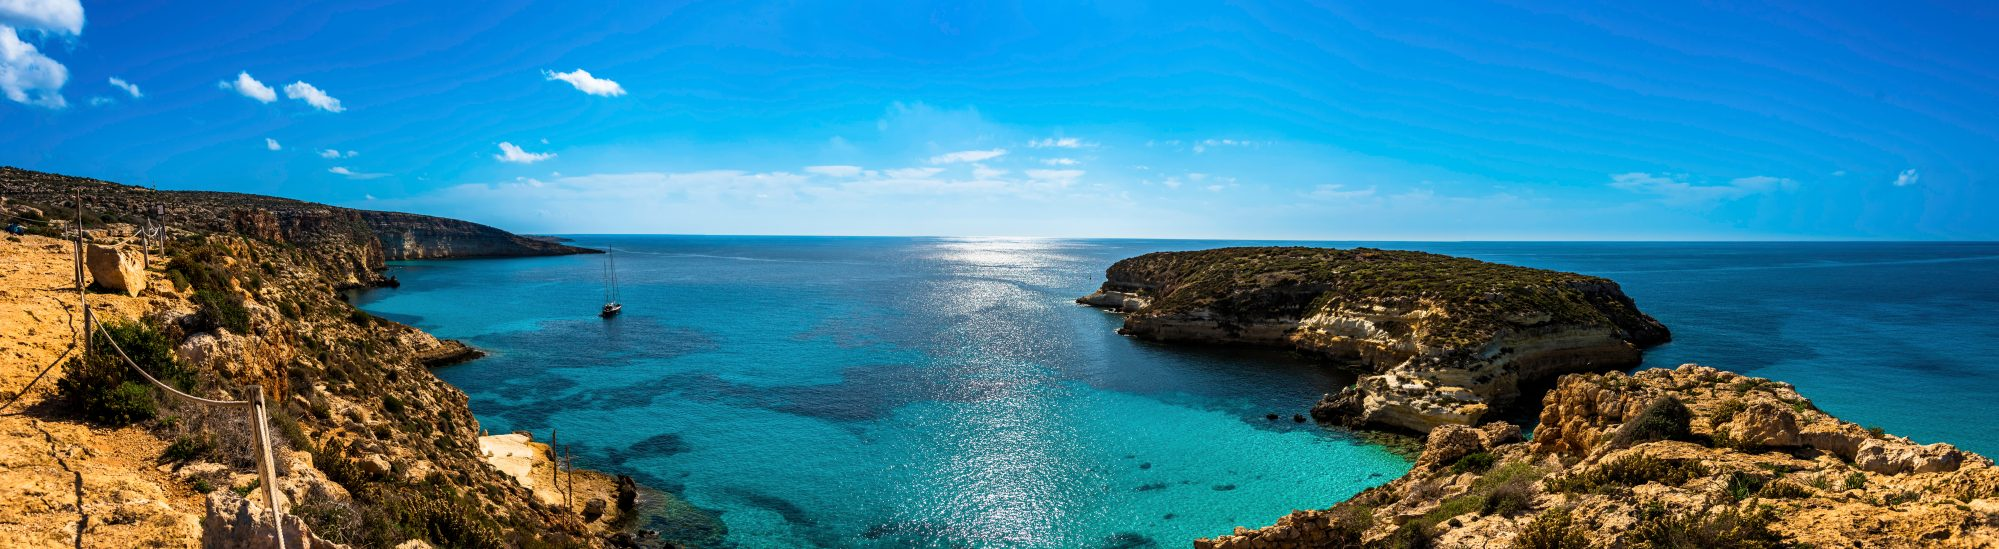 L'isola di Lampedusa